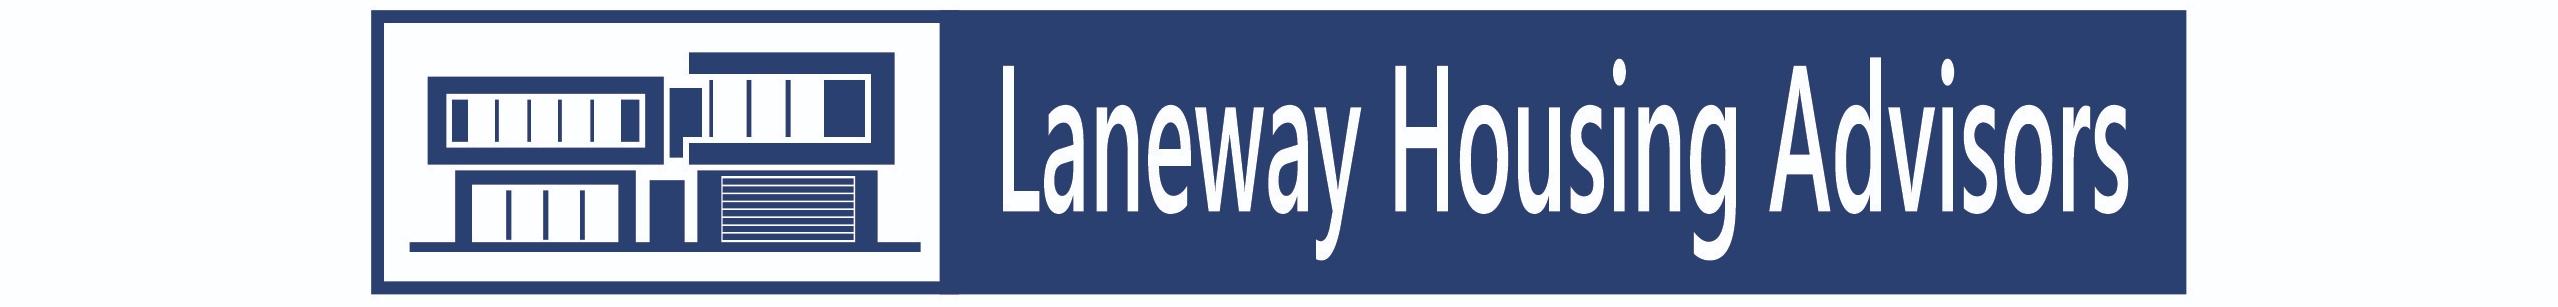 Laneway Housing Advisors